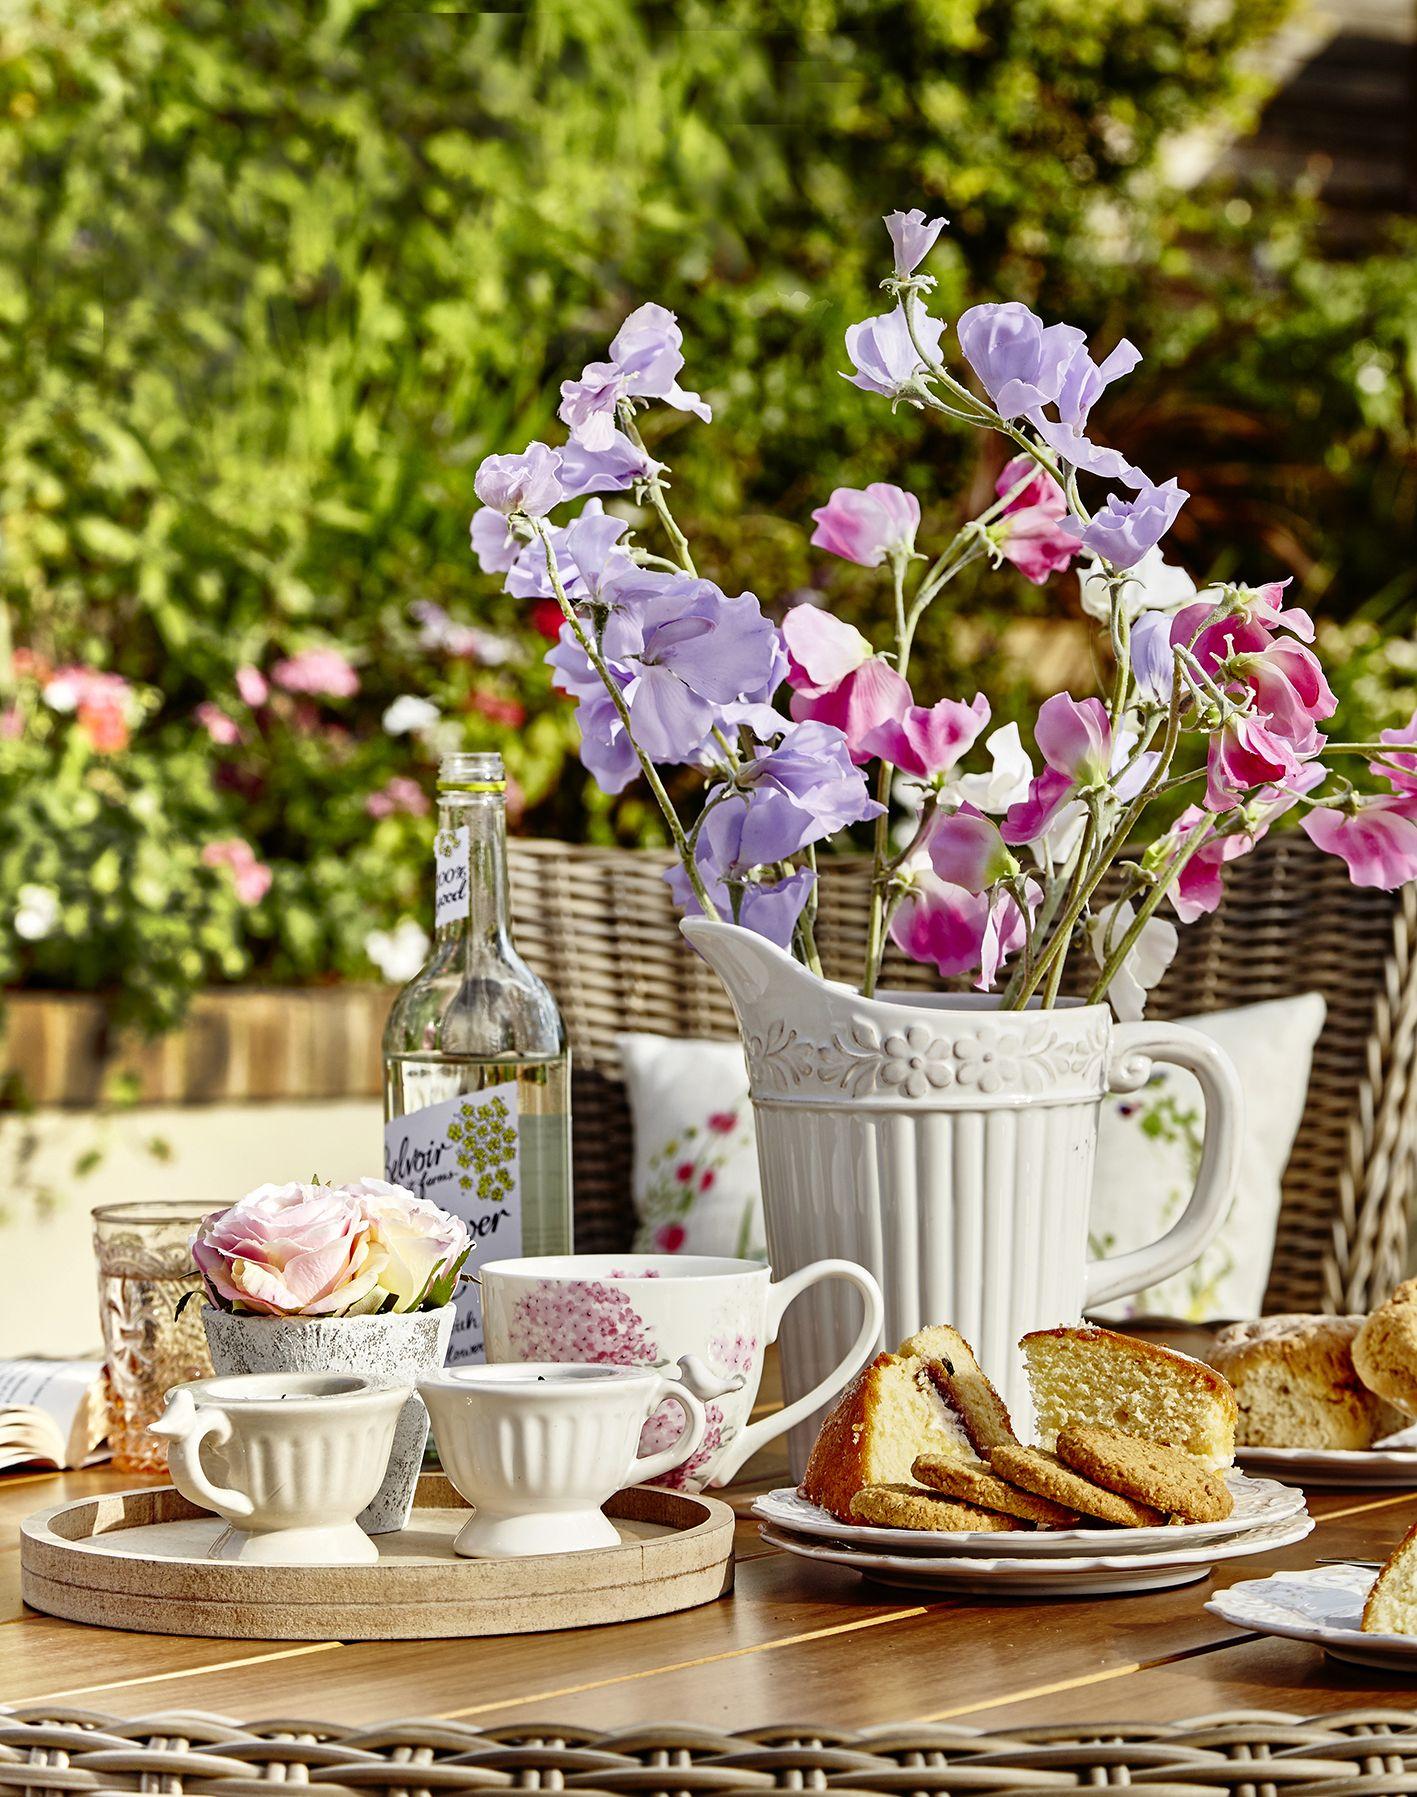 Ribbed white flower jug £16.99; Floral mugs £5.99; Teacup with bird tealight holder £3.99. www.dobies.co.uk